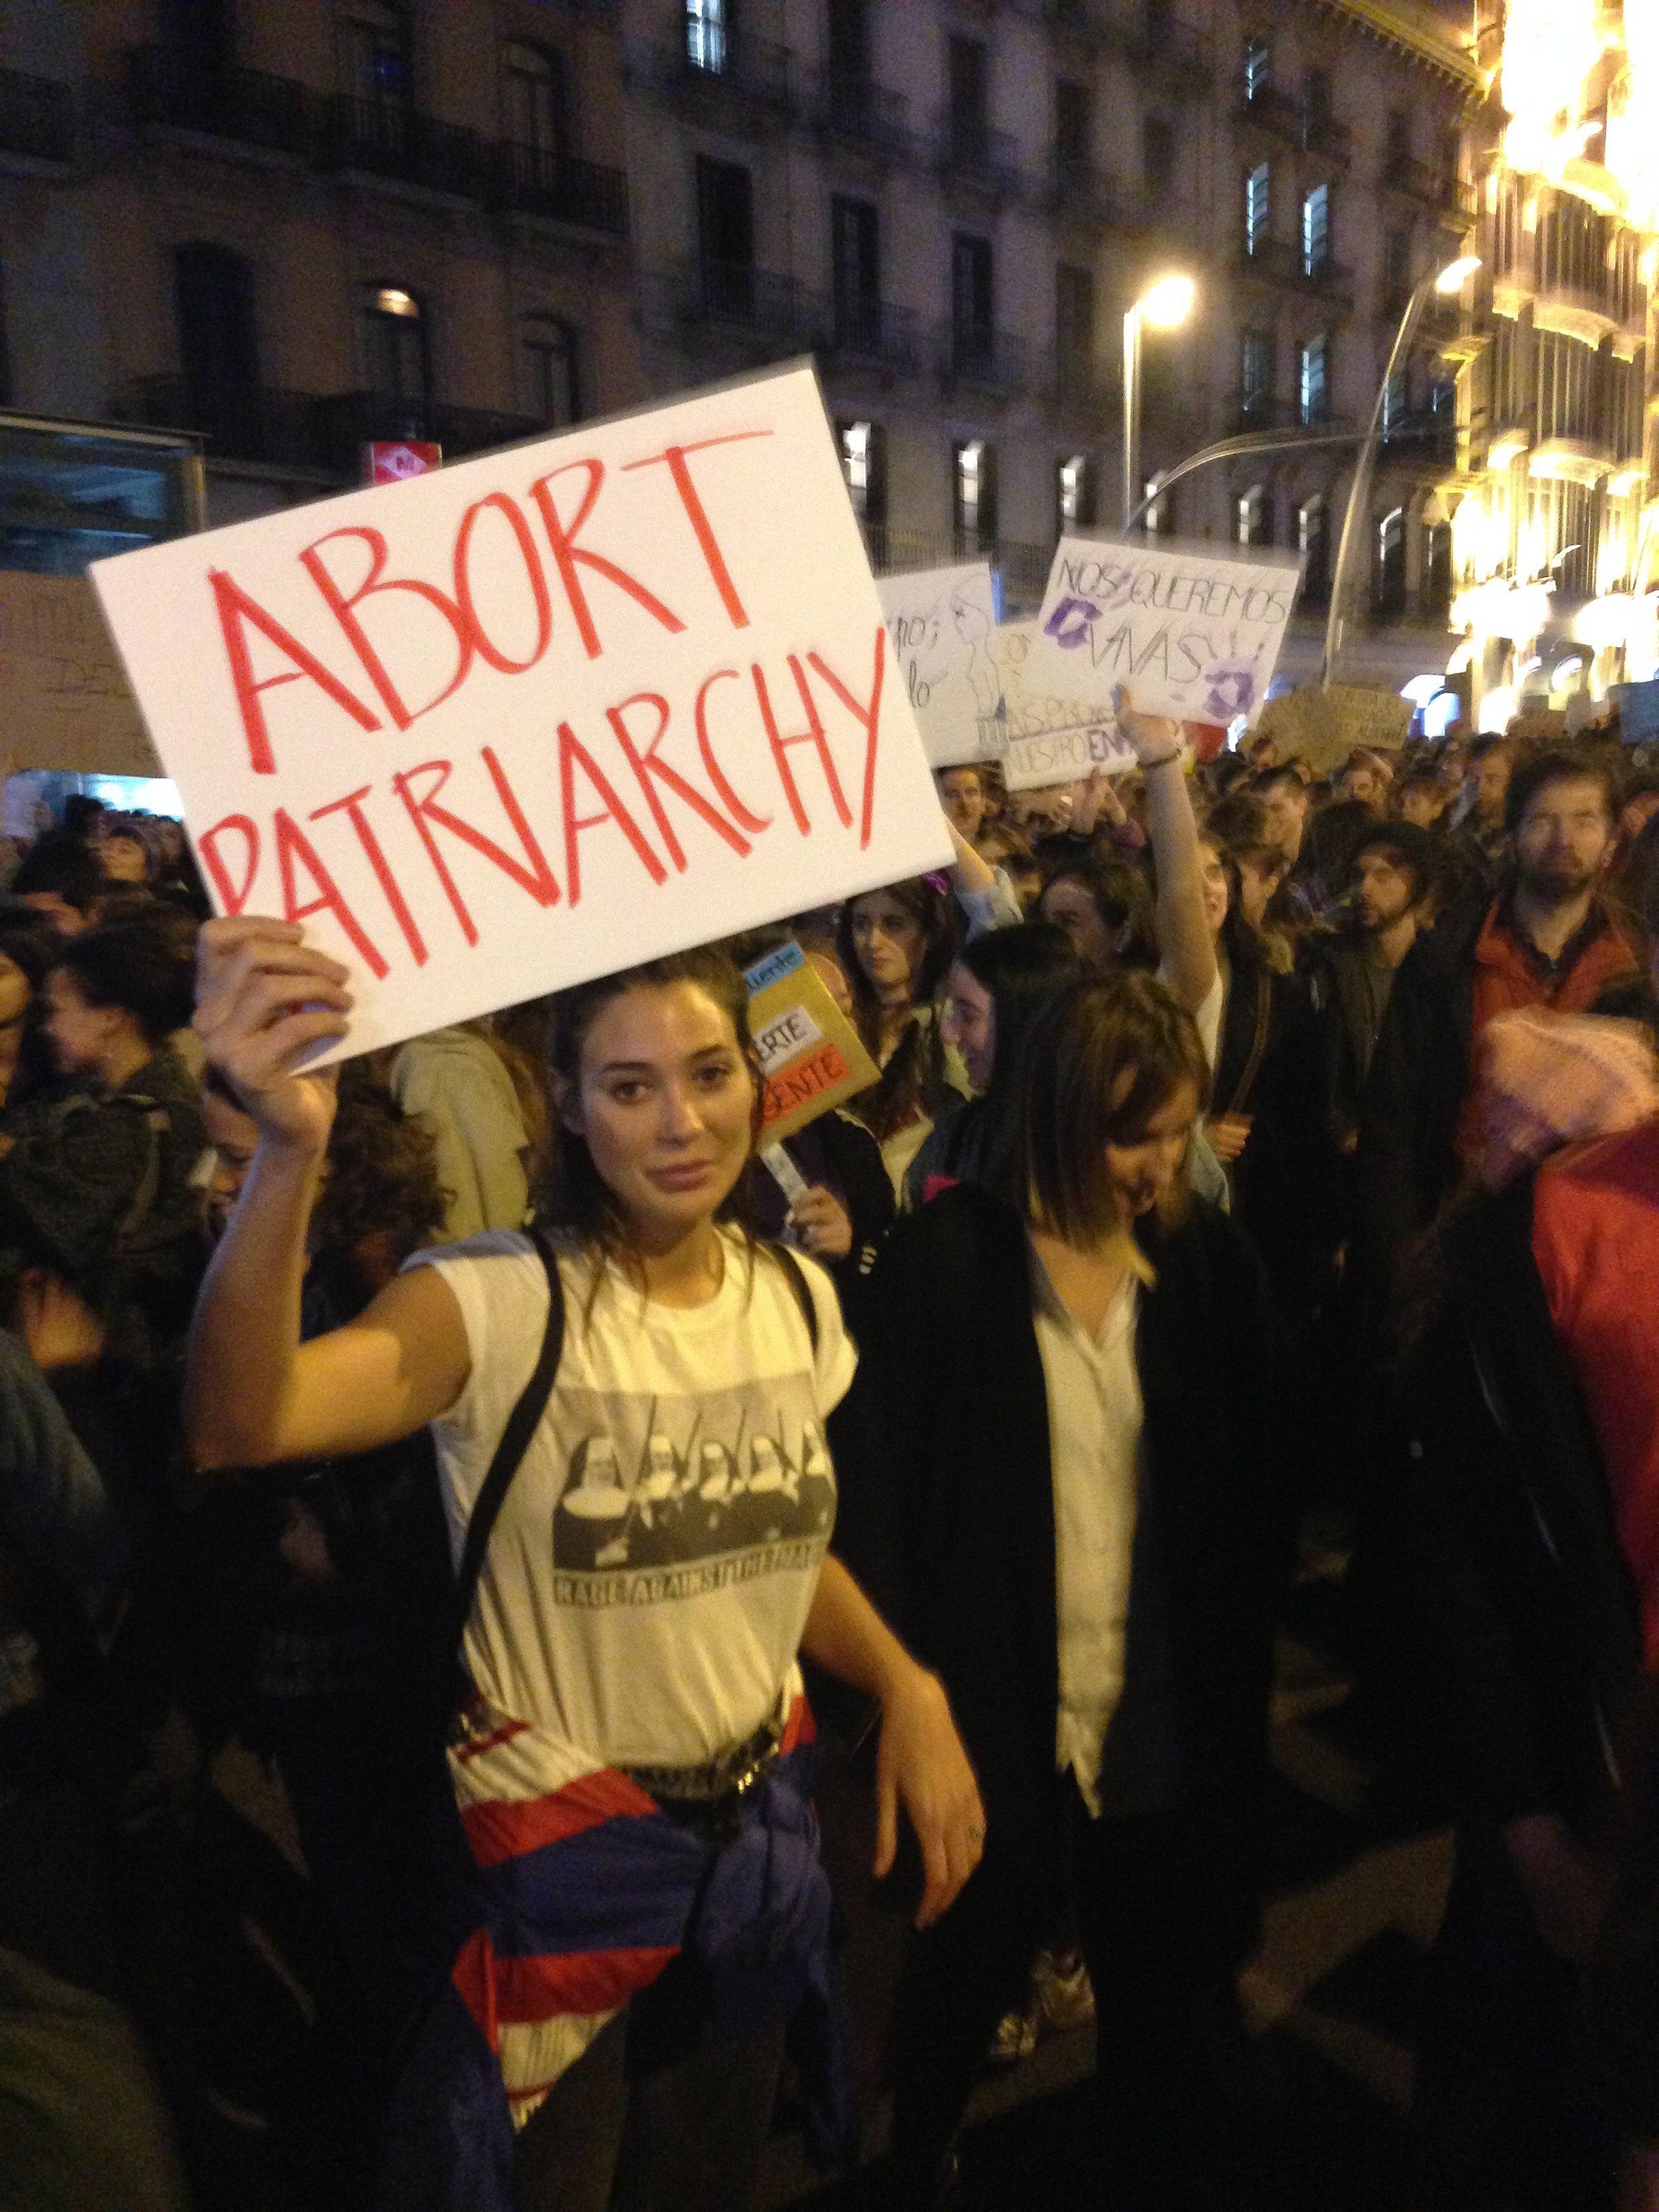 12 Abort Patriarchy